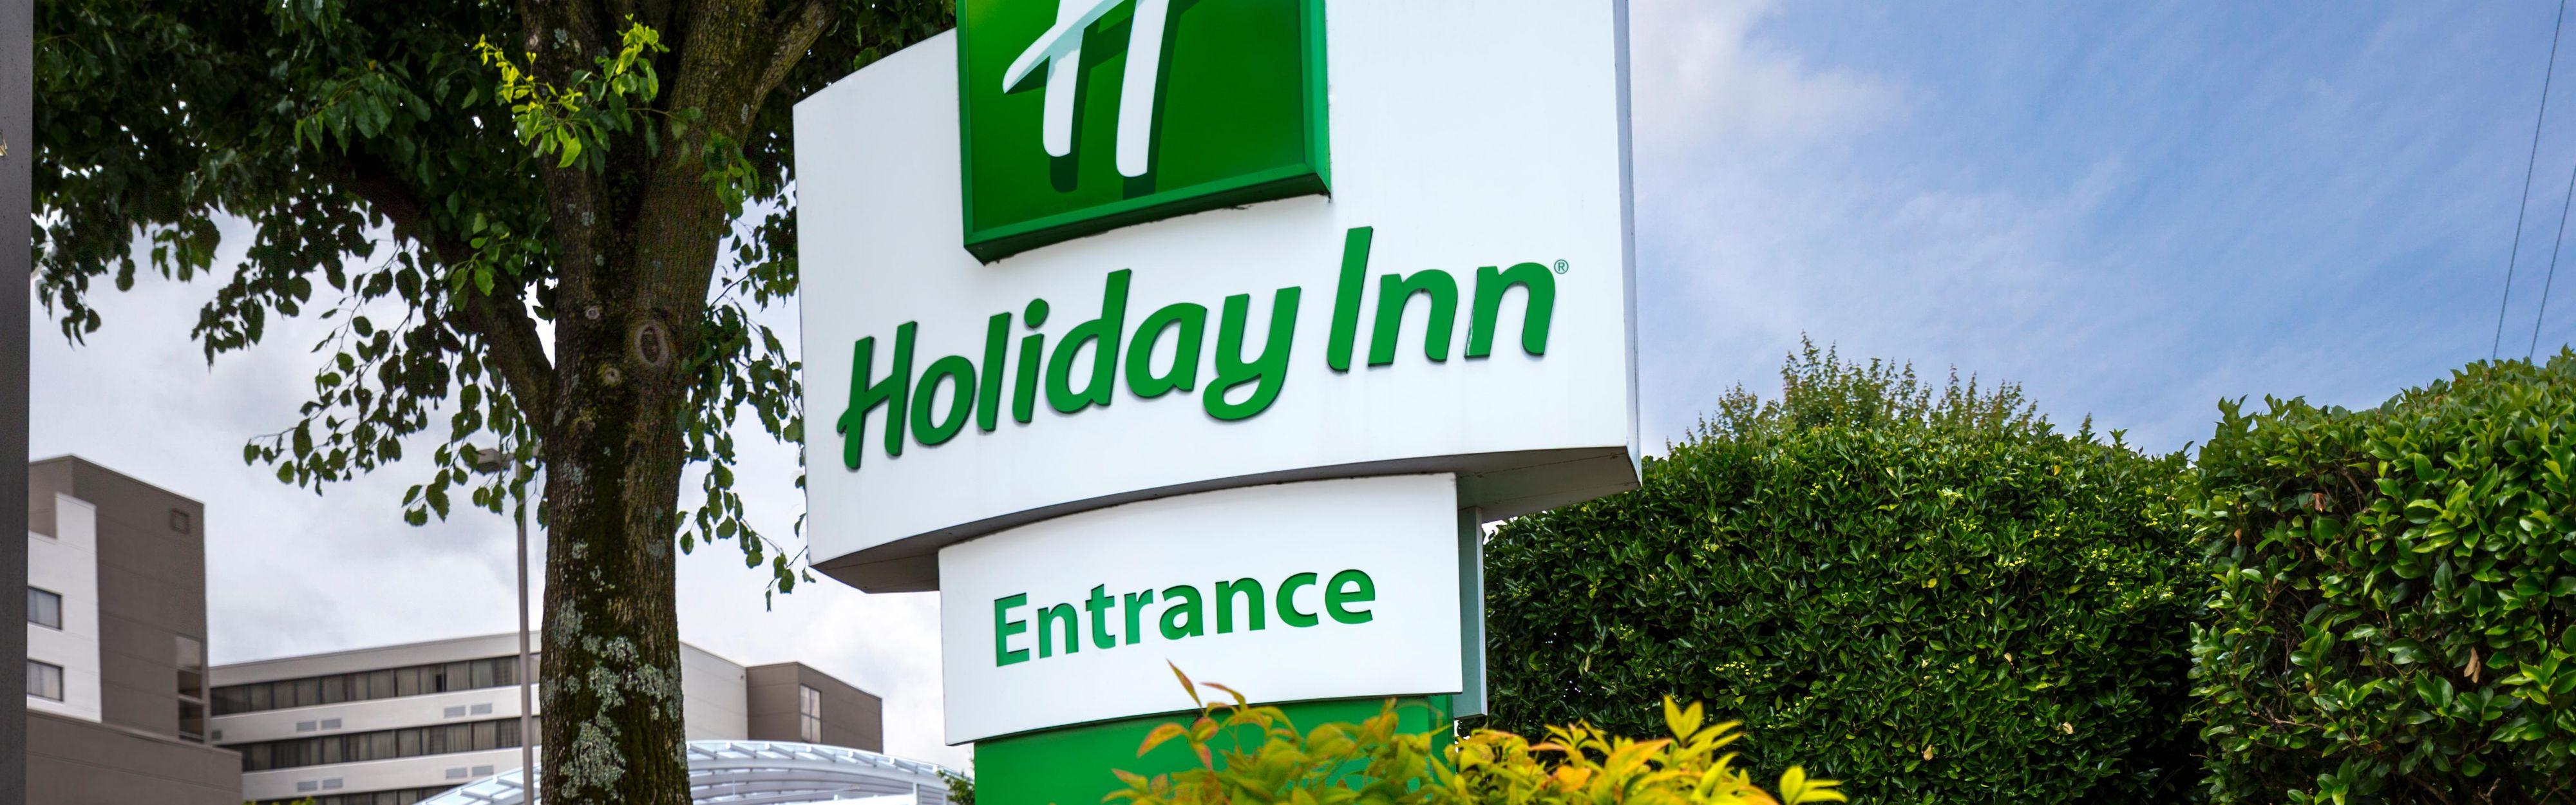 Holiday Inn Johnson City image 0